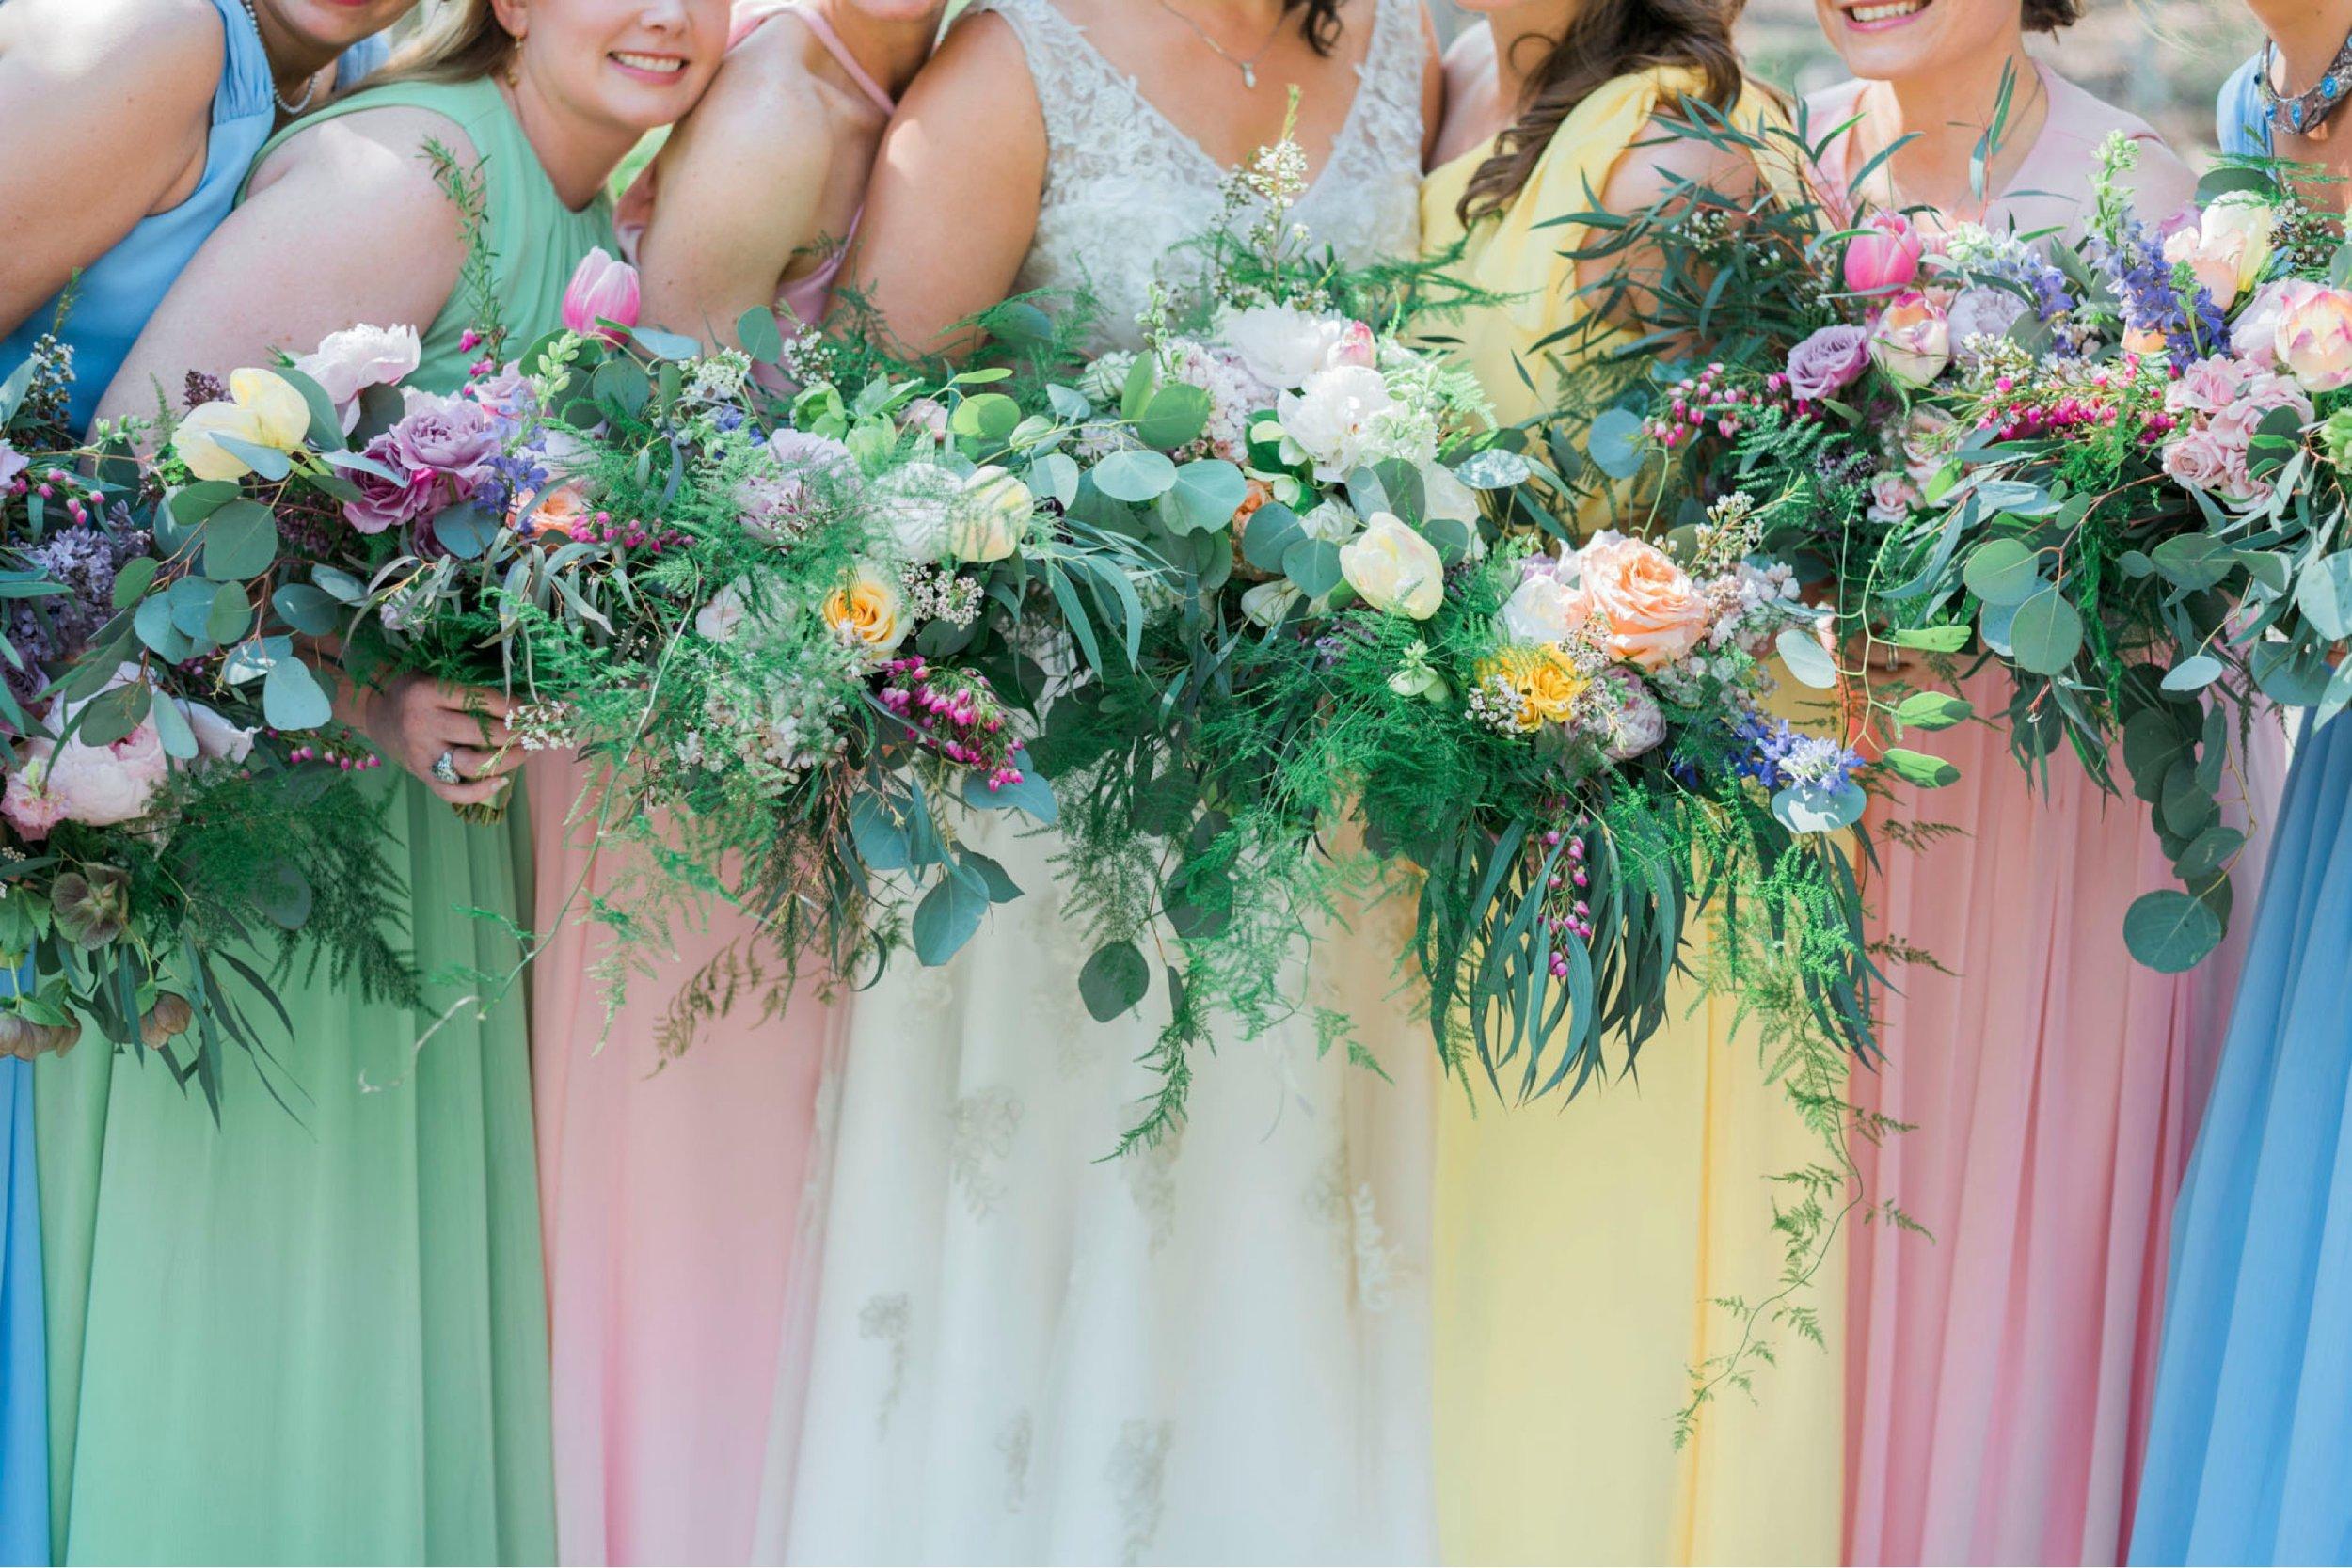 TheVirginianHotel_LynchburgVA_TheVirginianHotelWedding_Virginiaweddingphotographer_Lynchburgvawedding 37.jpg